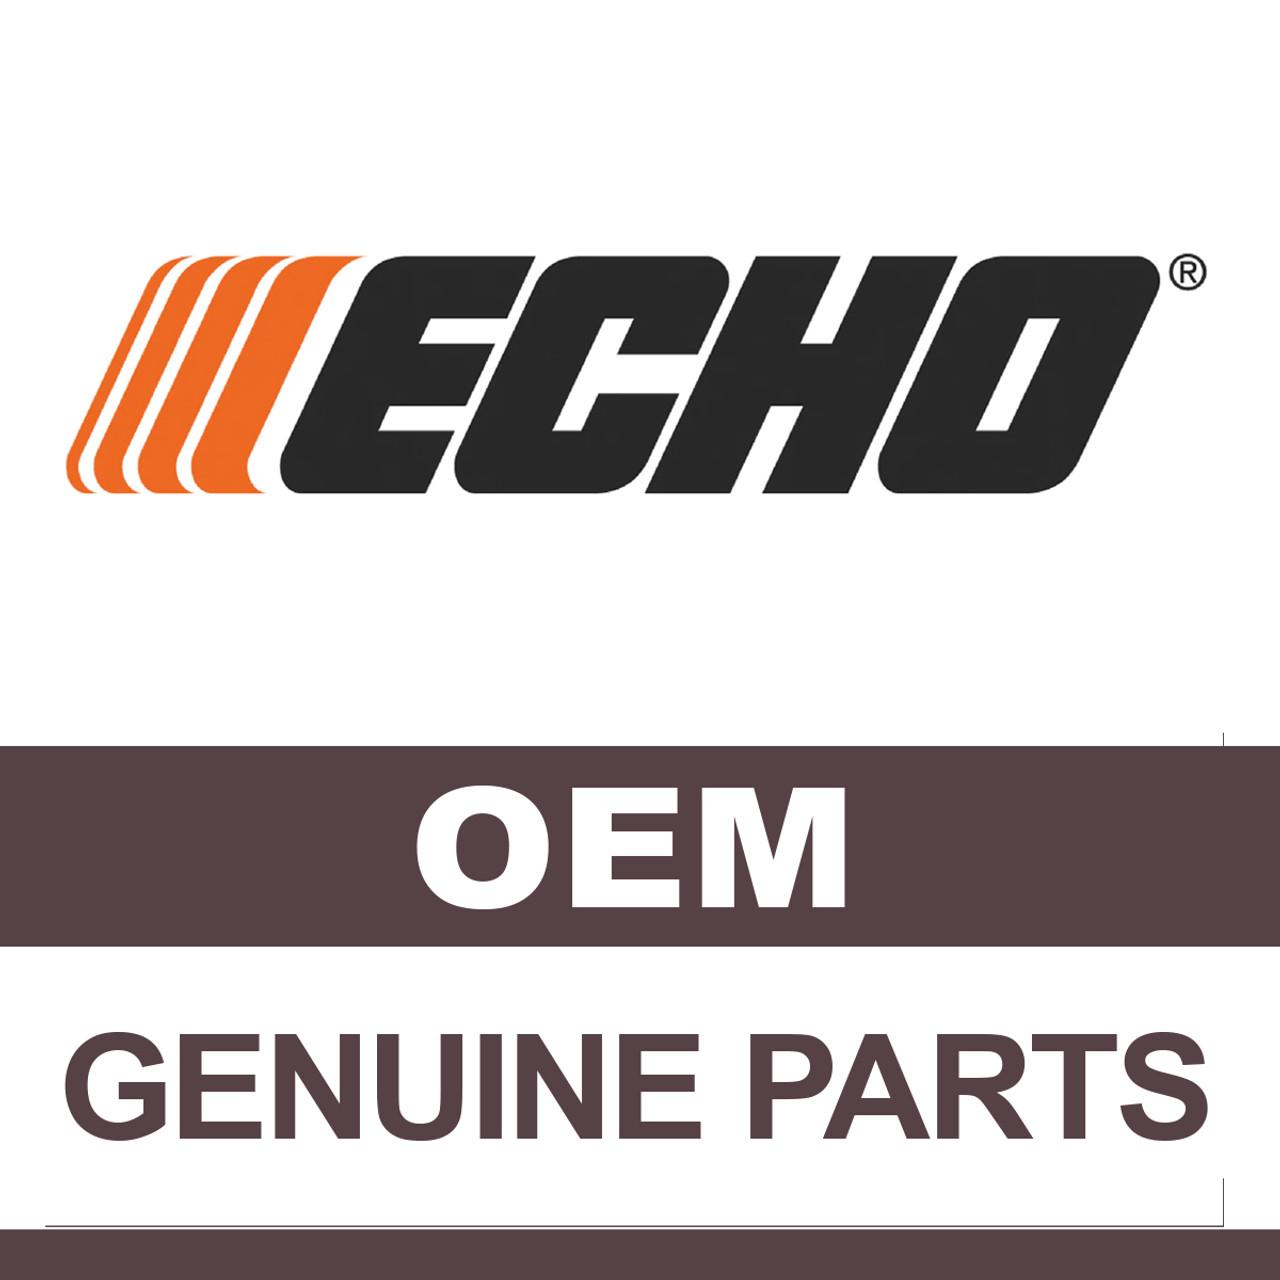 LARGE 91150 Genuine Echo Part ETHANOL TESTER